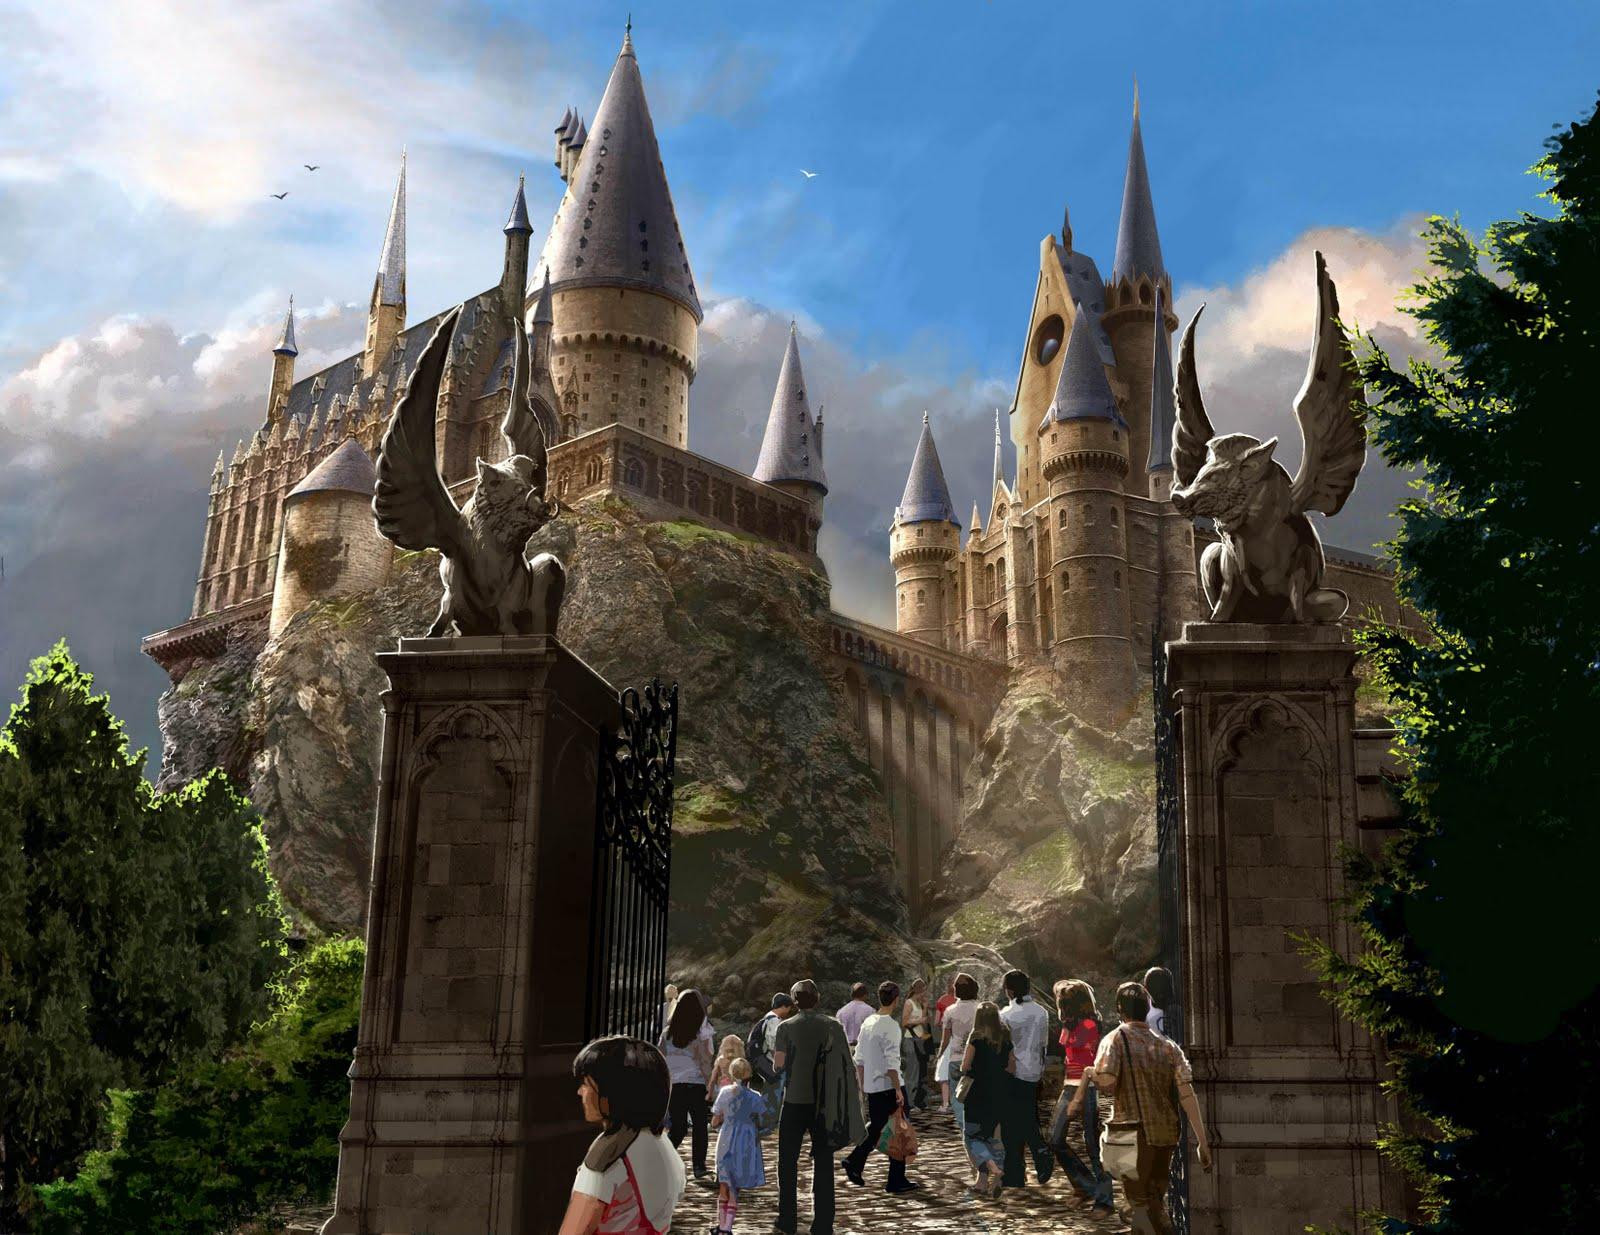 http://4.bp.blogspot.com/_53cf51oMmEk/TBN3SG4KRgI/AAAAAAAAClY/oppeHToMksw/s1600/Hogwarts%25252BCastle%25252B2%25252B-%25252BUniversal%25252BOrlando.jpg